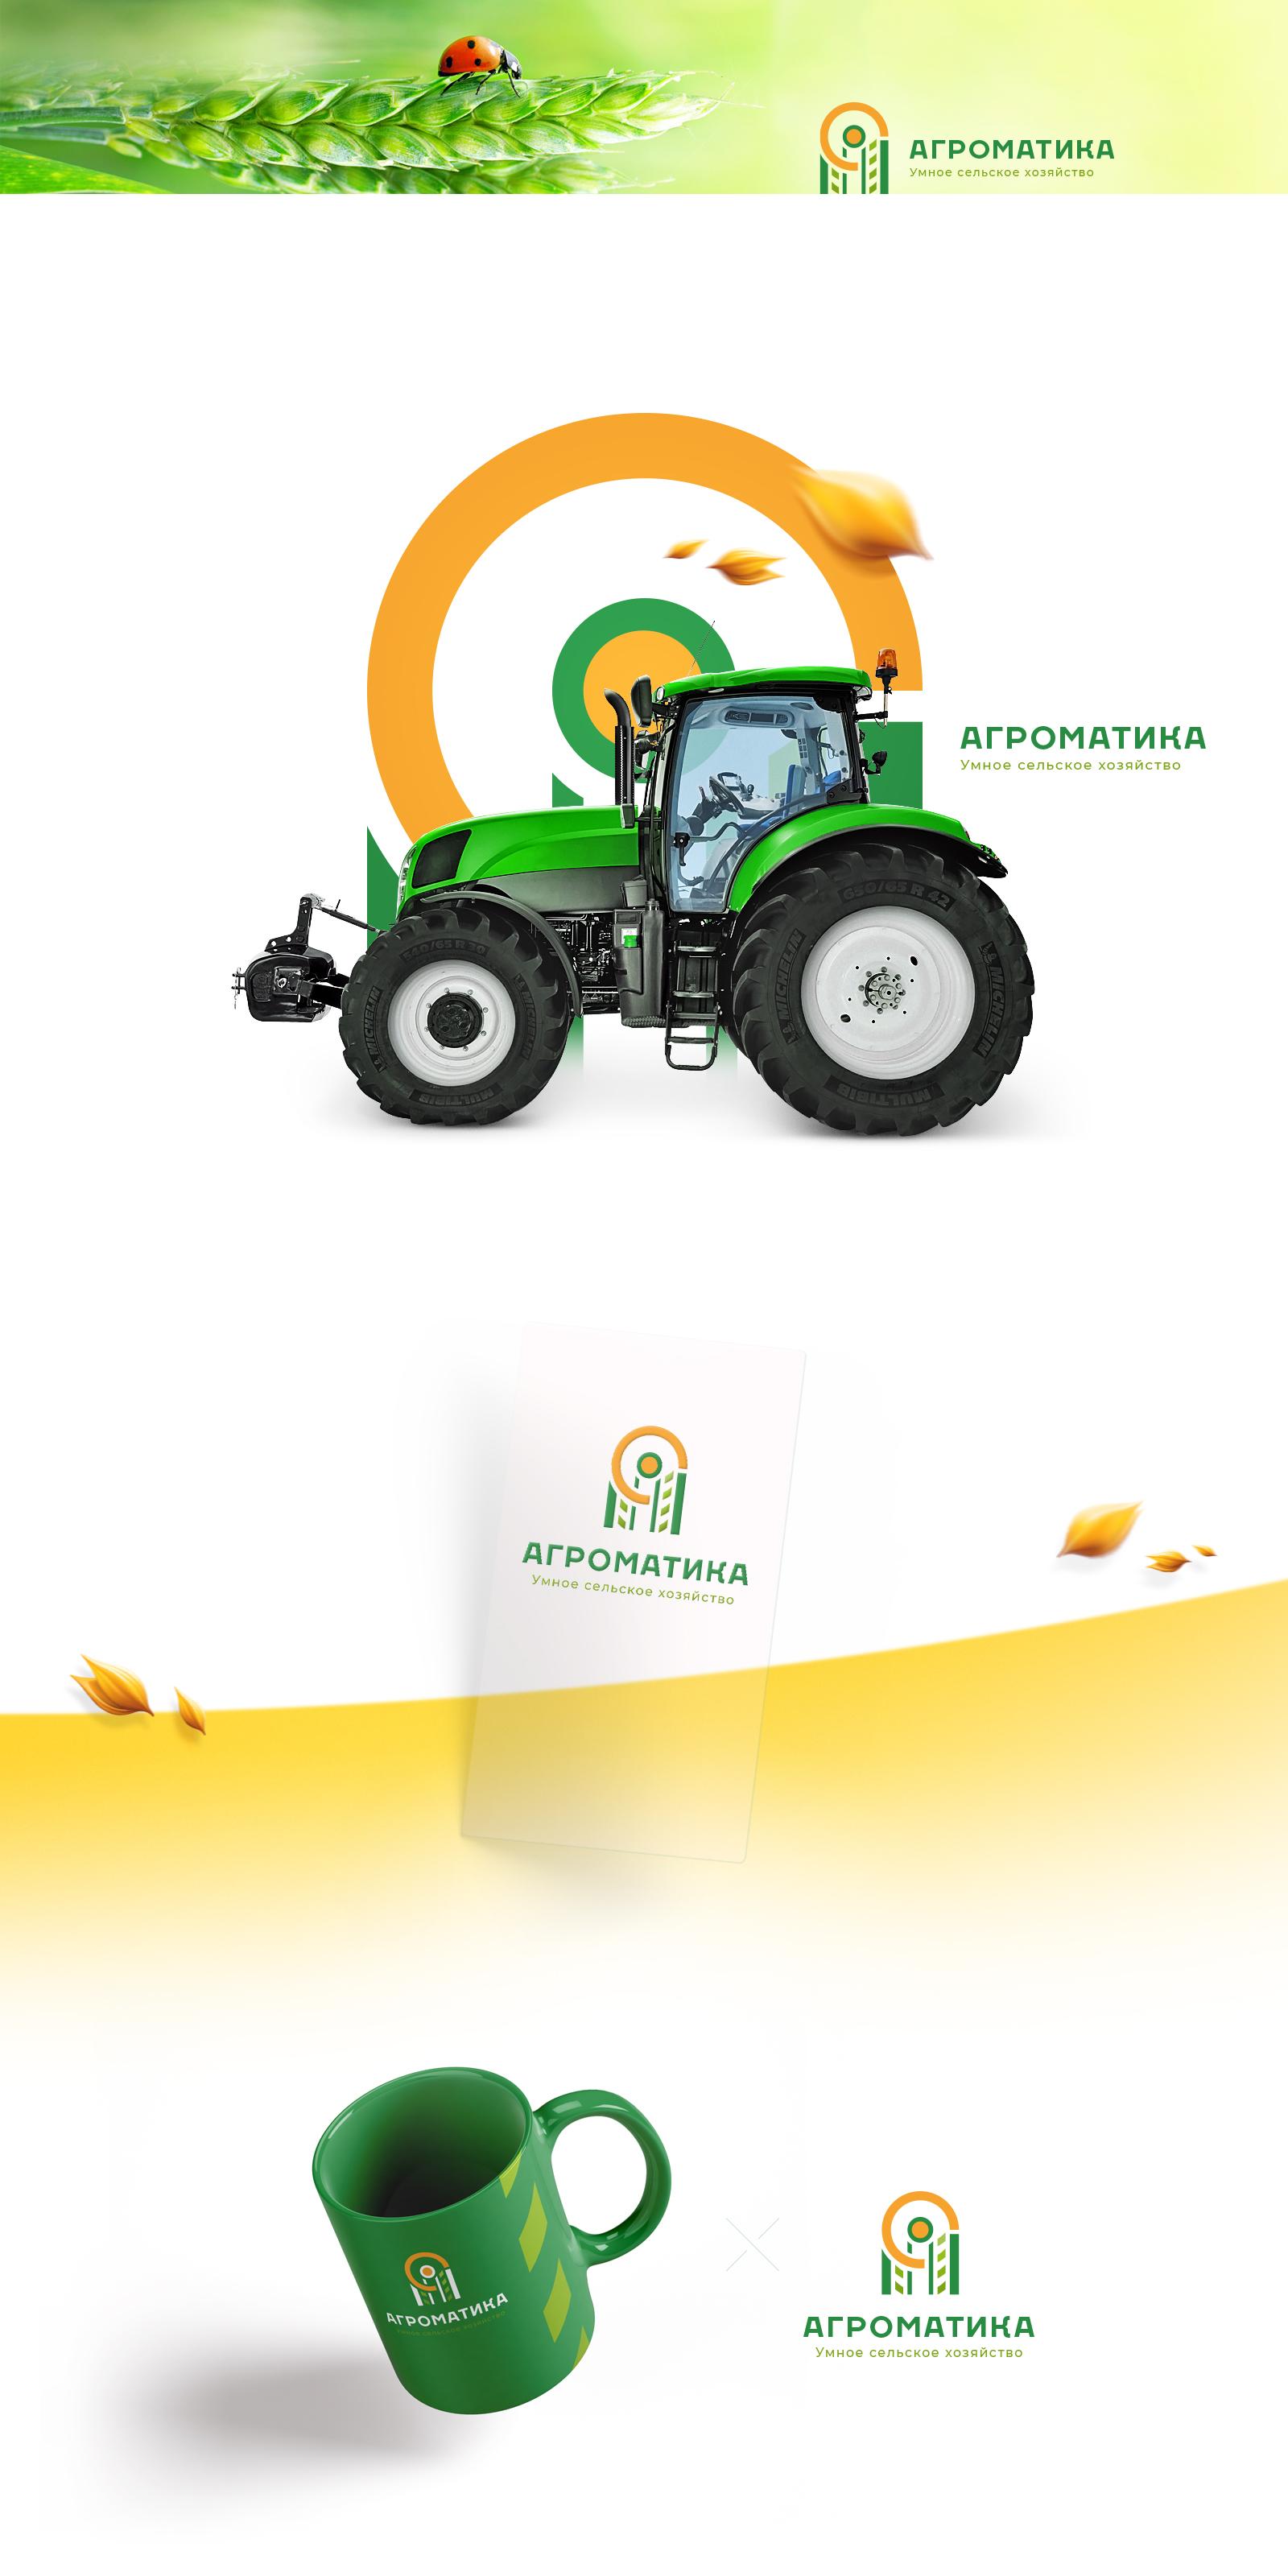 Дизайн логотипа производителя оборудования для с/х хозяйства